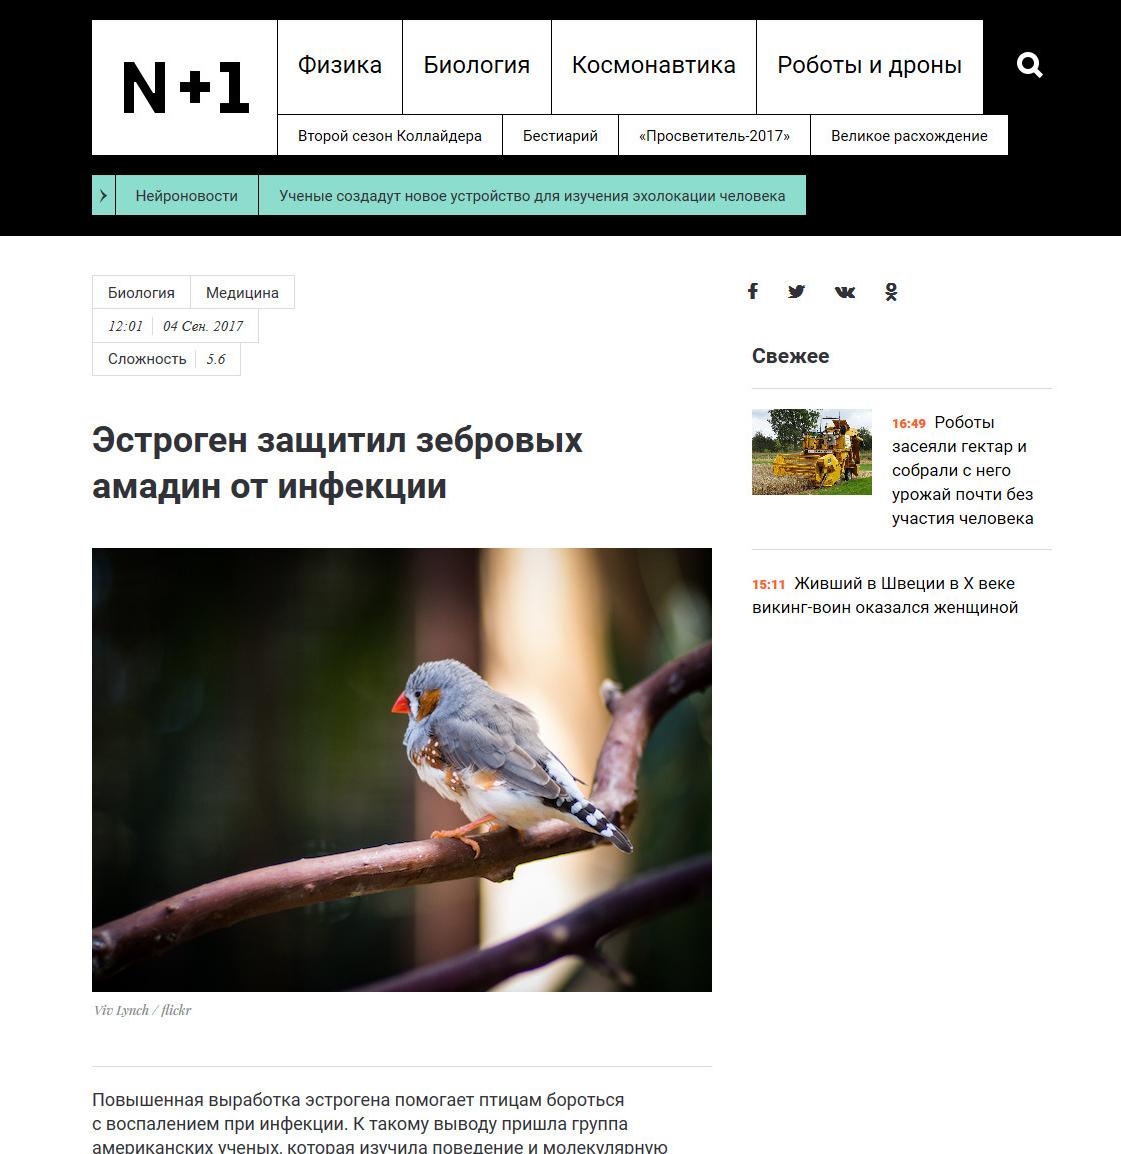 screenshot-nplus1.ru-2017-09-09-11-41-27.jpg